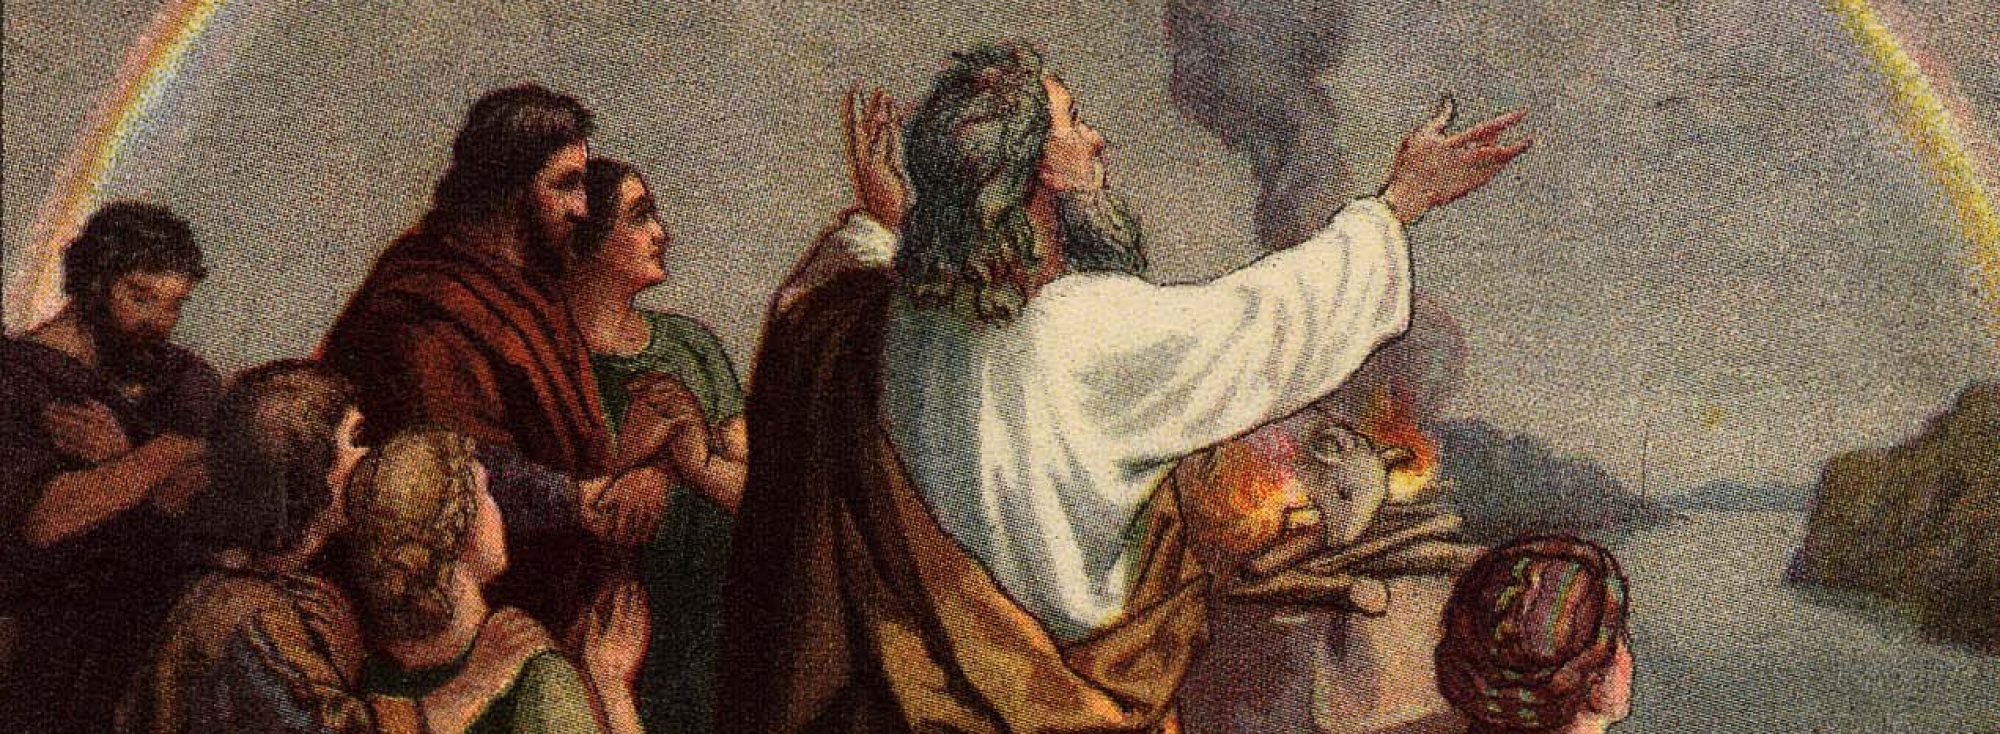 Noah begat 3 sons ...